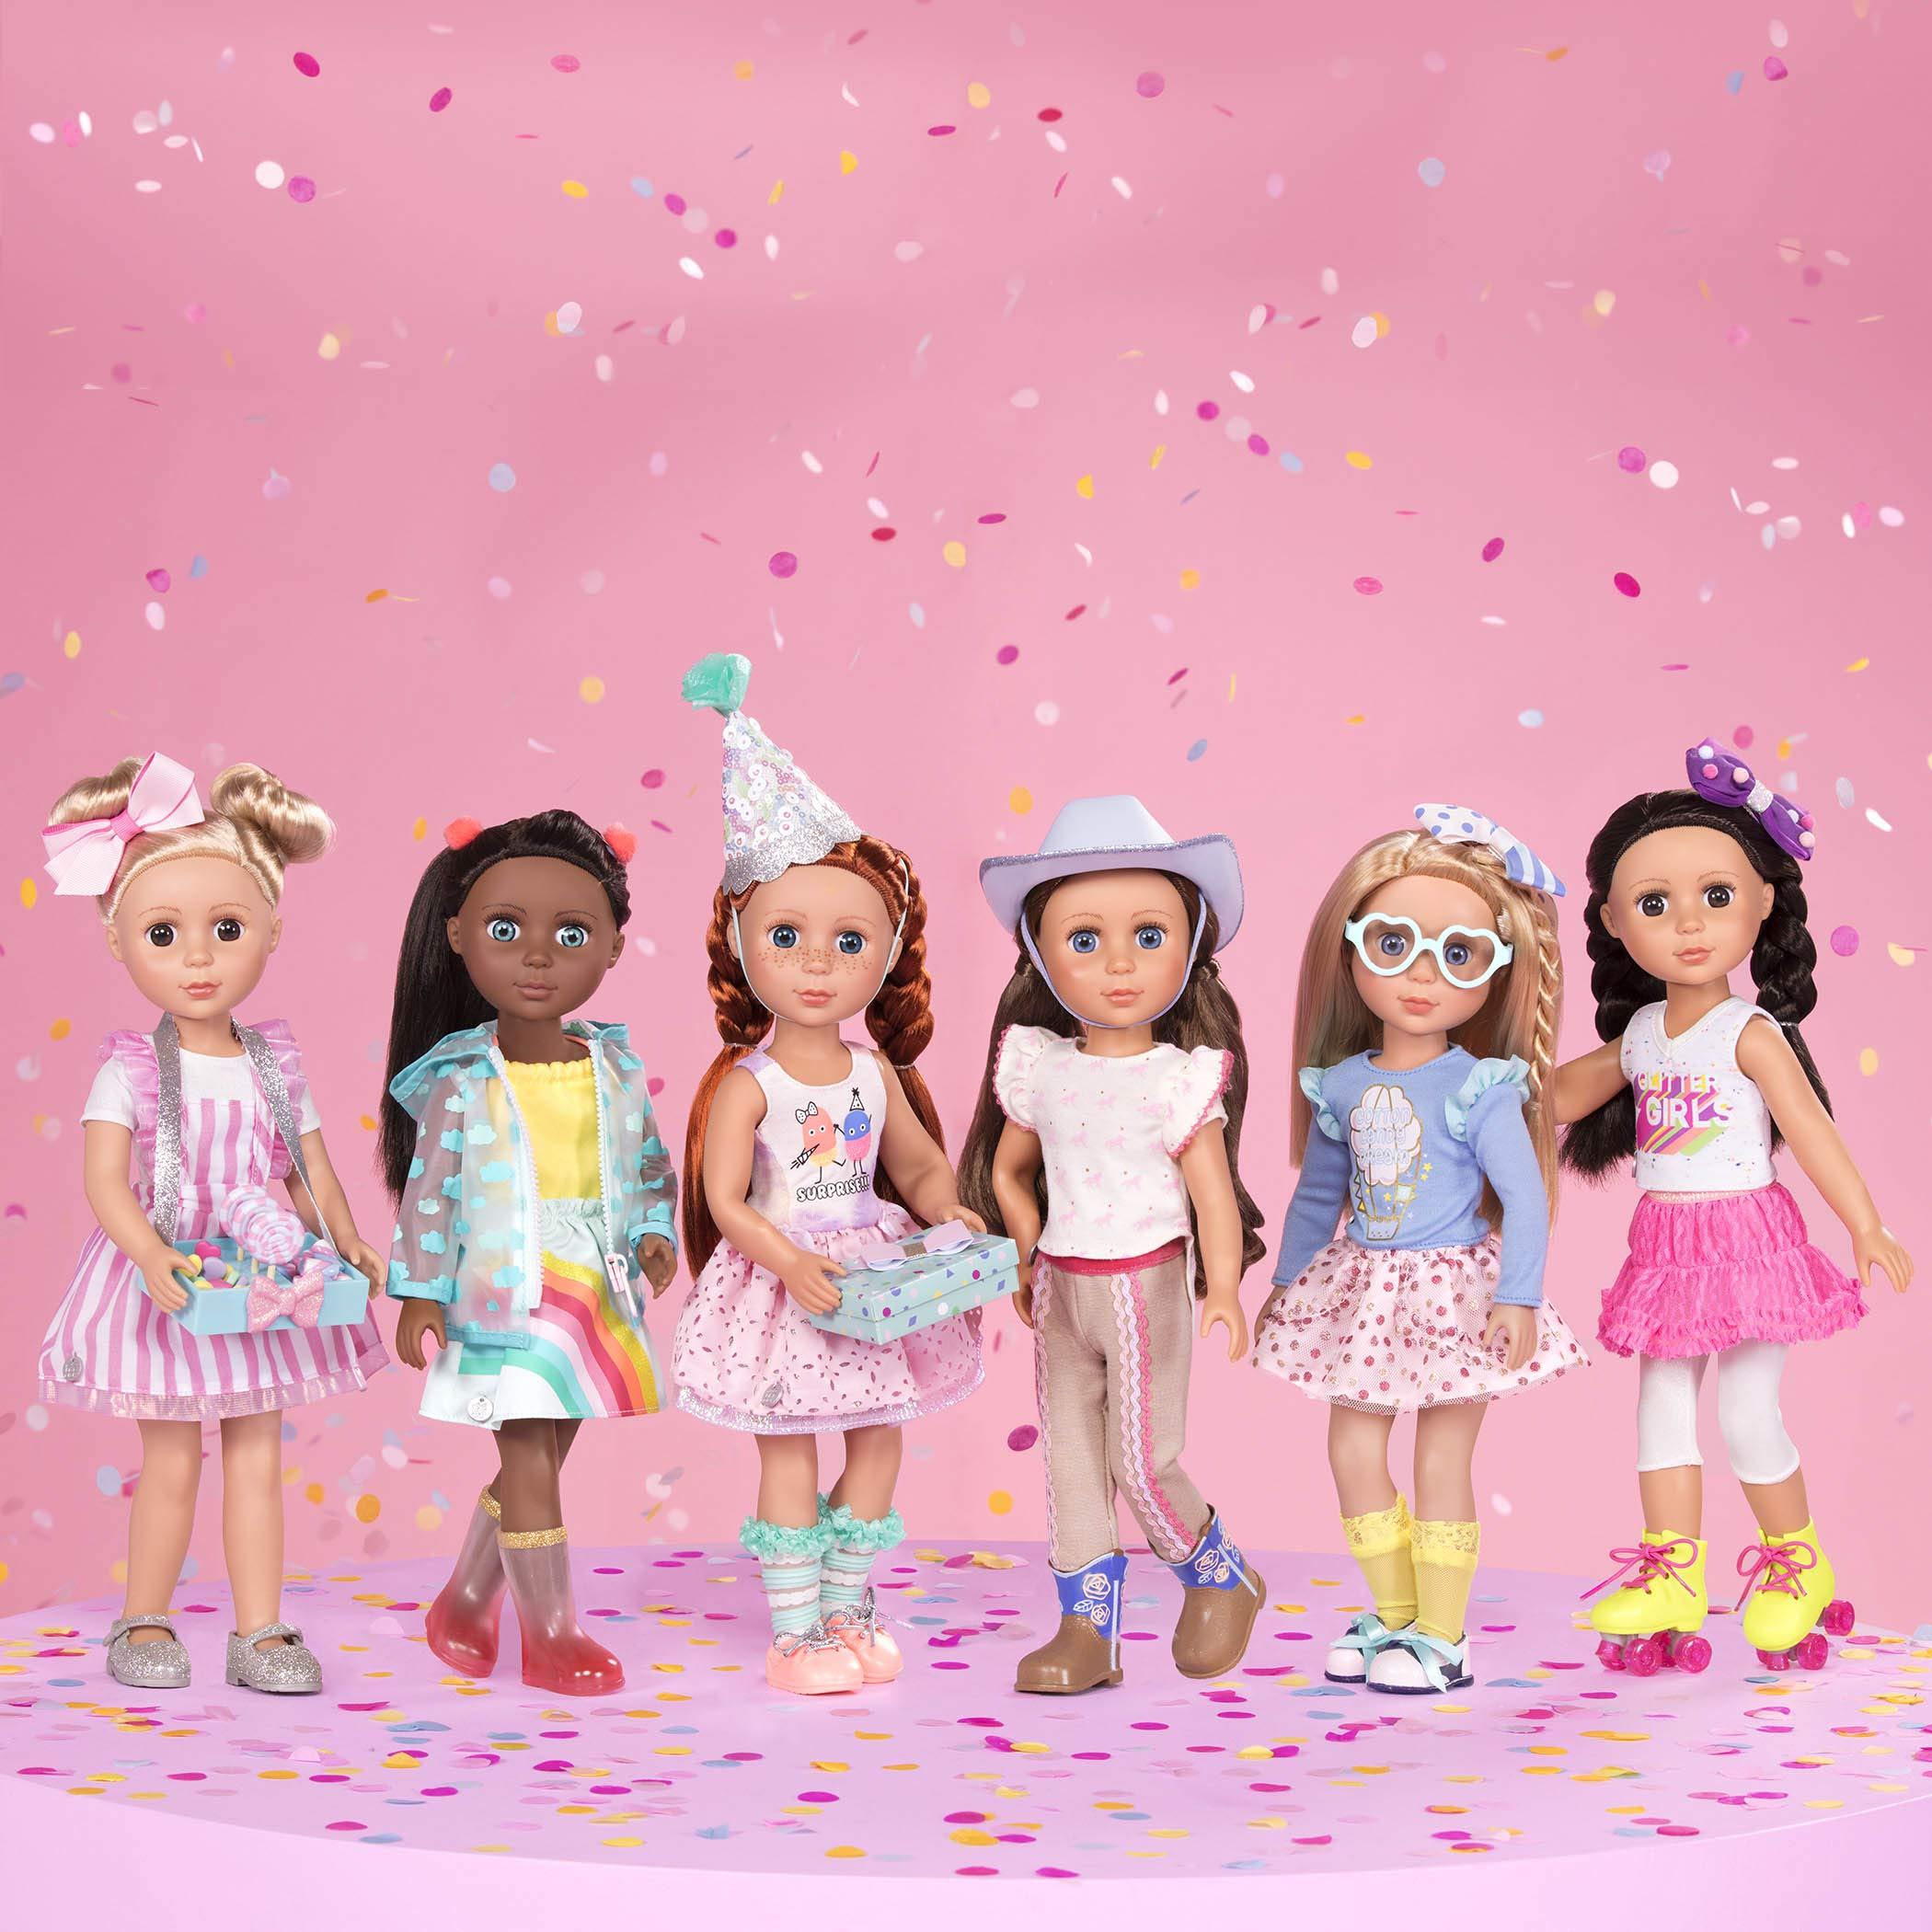 "Glitter Girls Dolls by Battat - Bluebell 14"" Poseable Fashion Doll - Dolls for Girls Age 3 & Up"